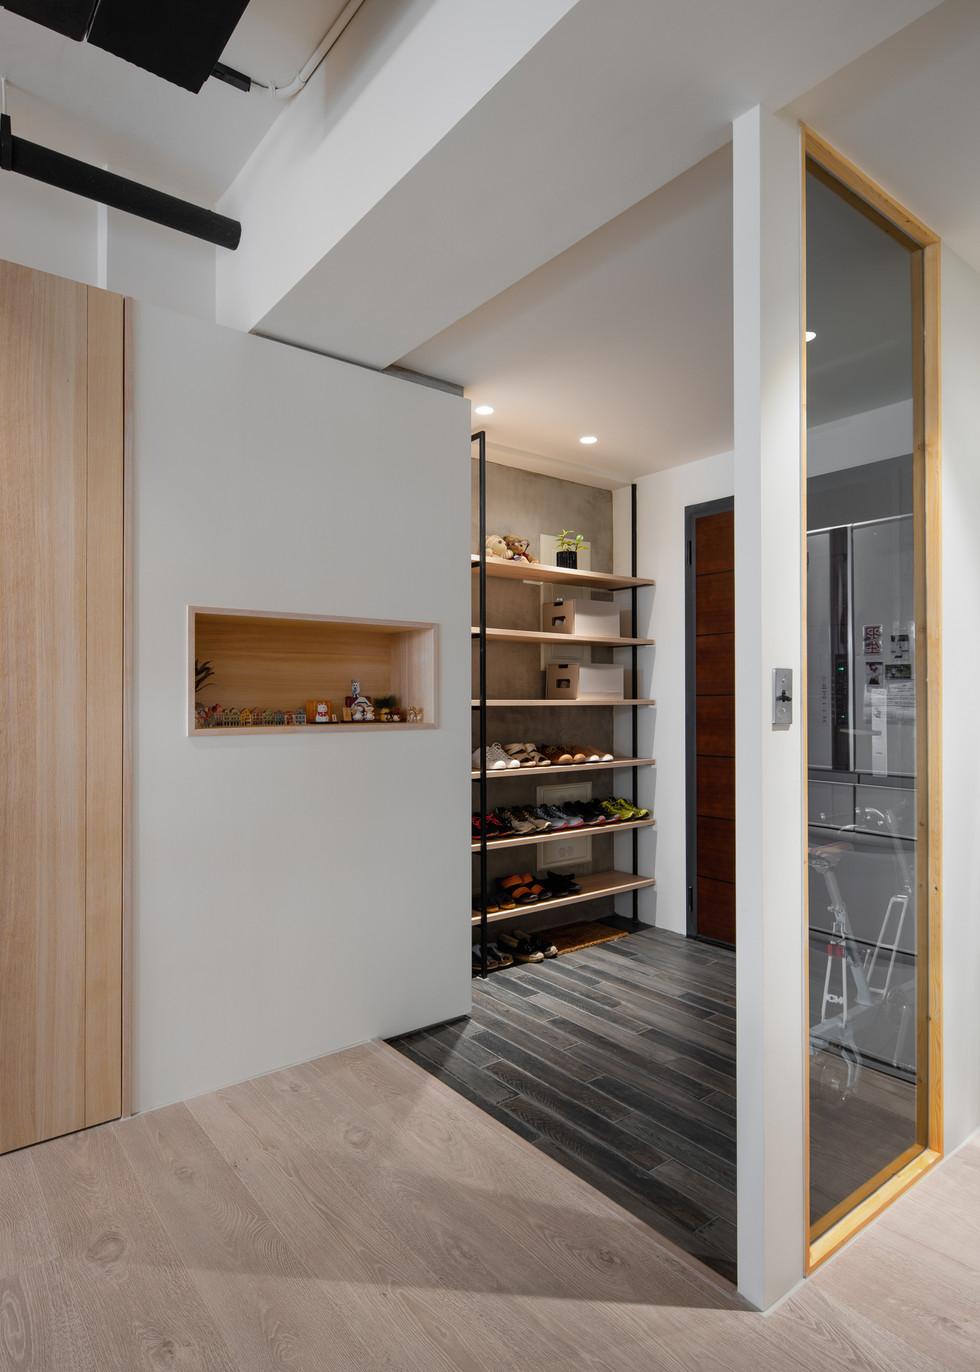 Interiors-12.jpg